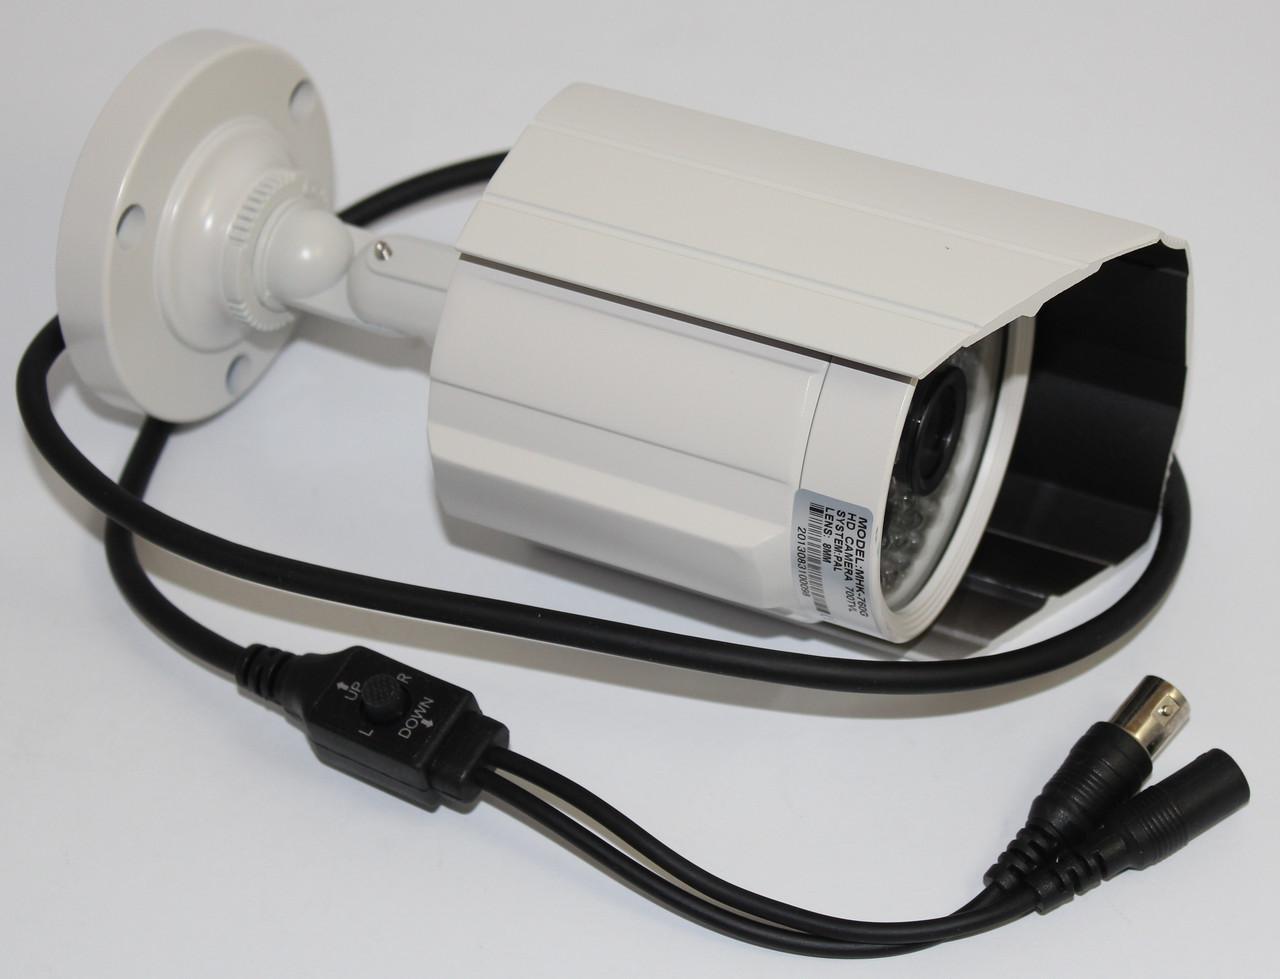 Камера наружного наблюдения бежевая (MHK-760G)